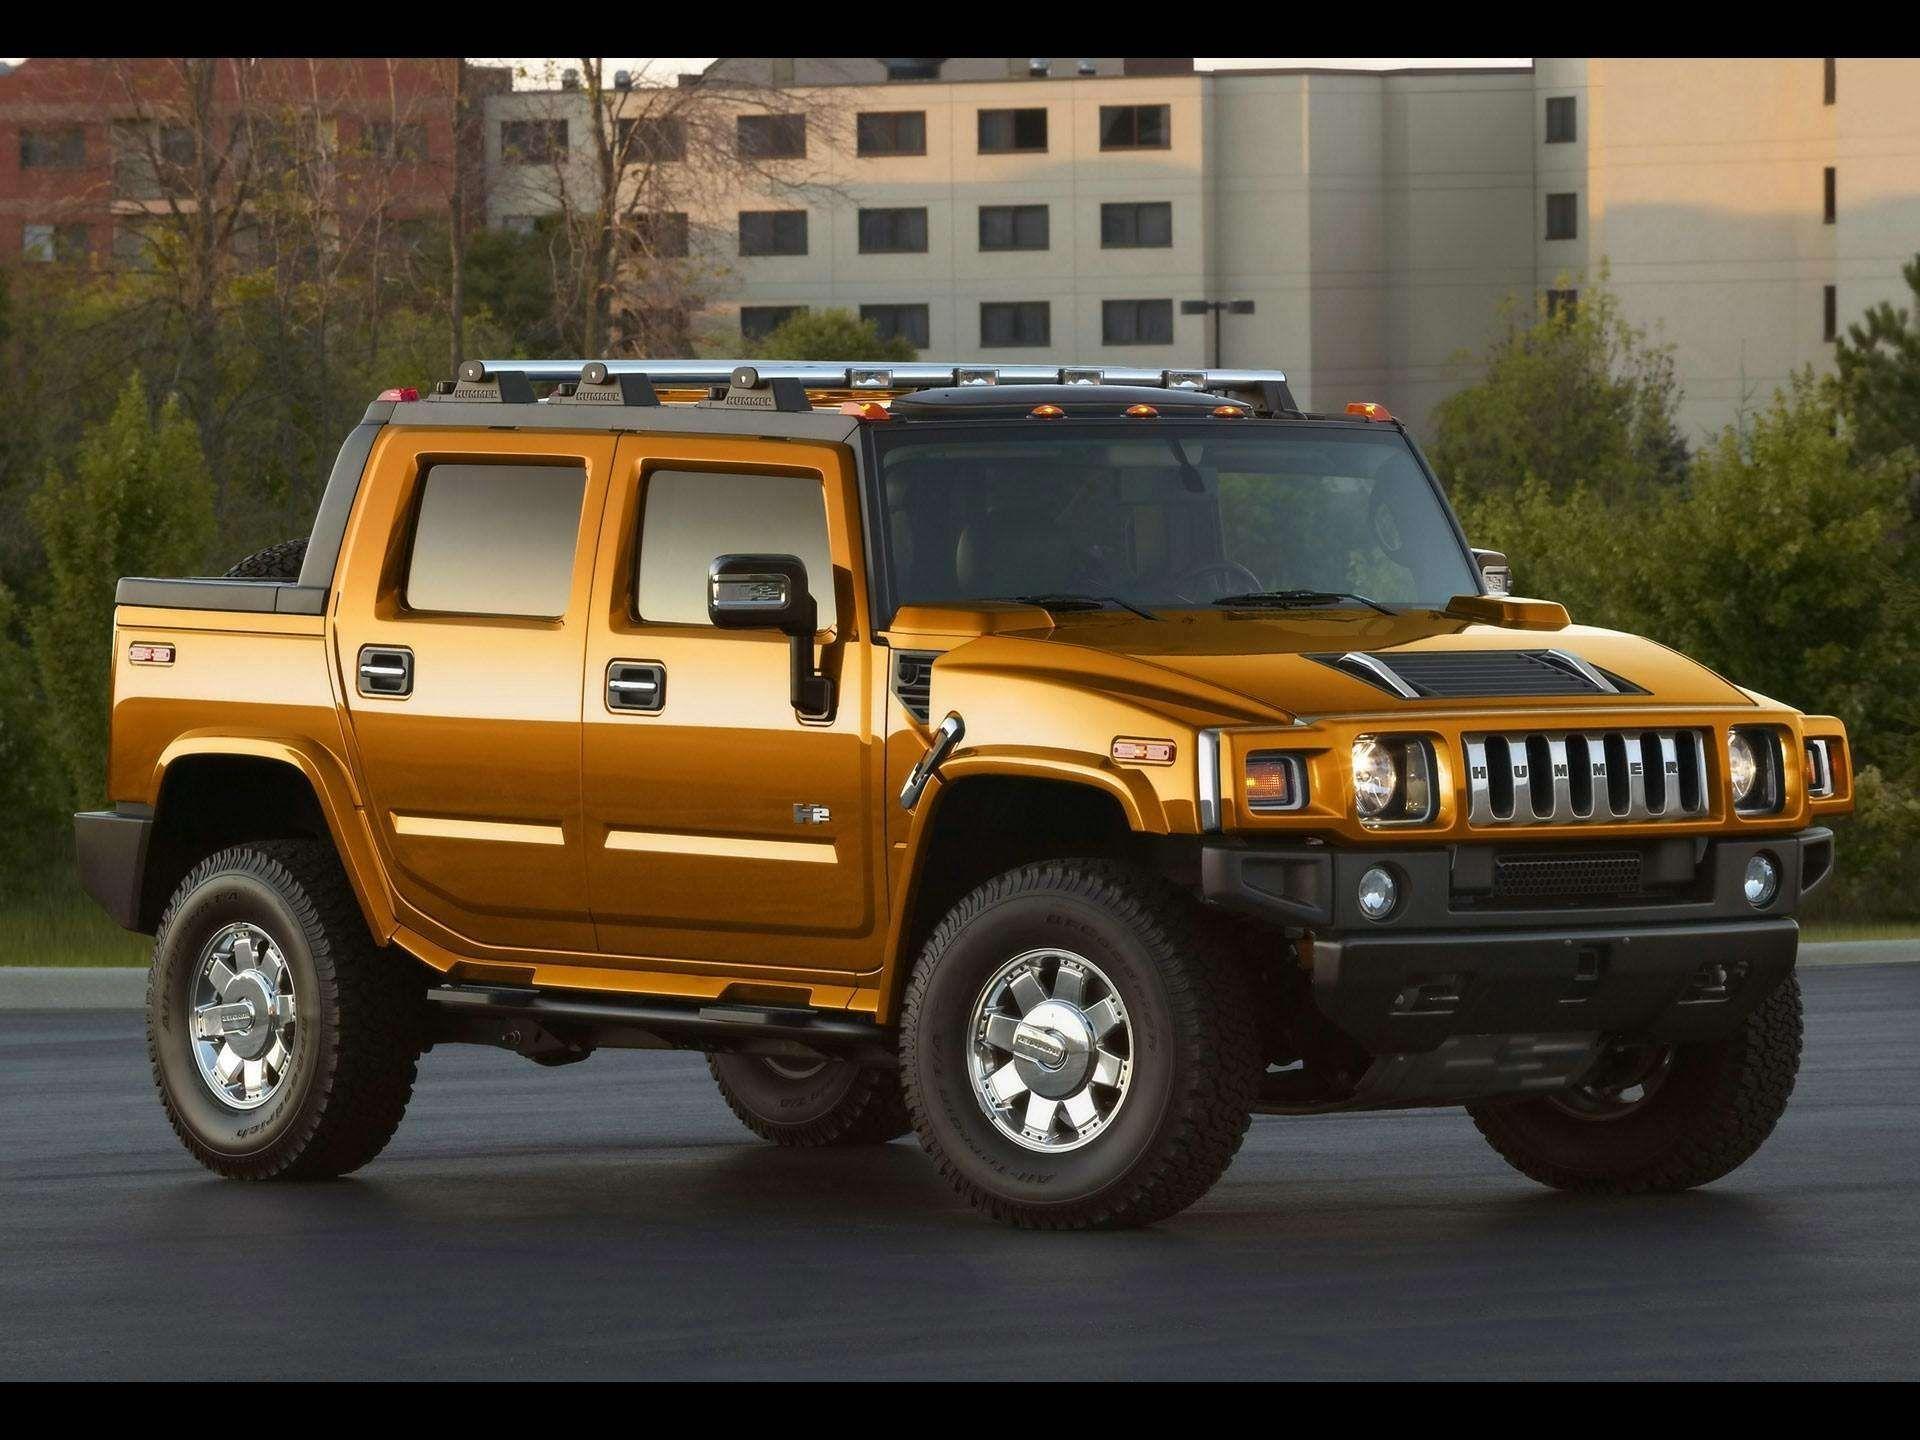 Hummer-H13-Golden-Color-Car-hd-wallpaper | Hummer HD ... | golden hummer